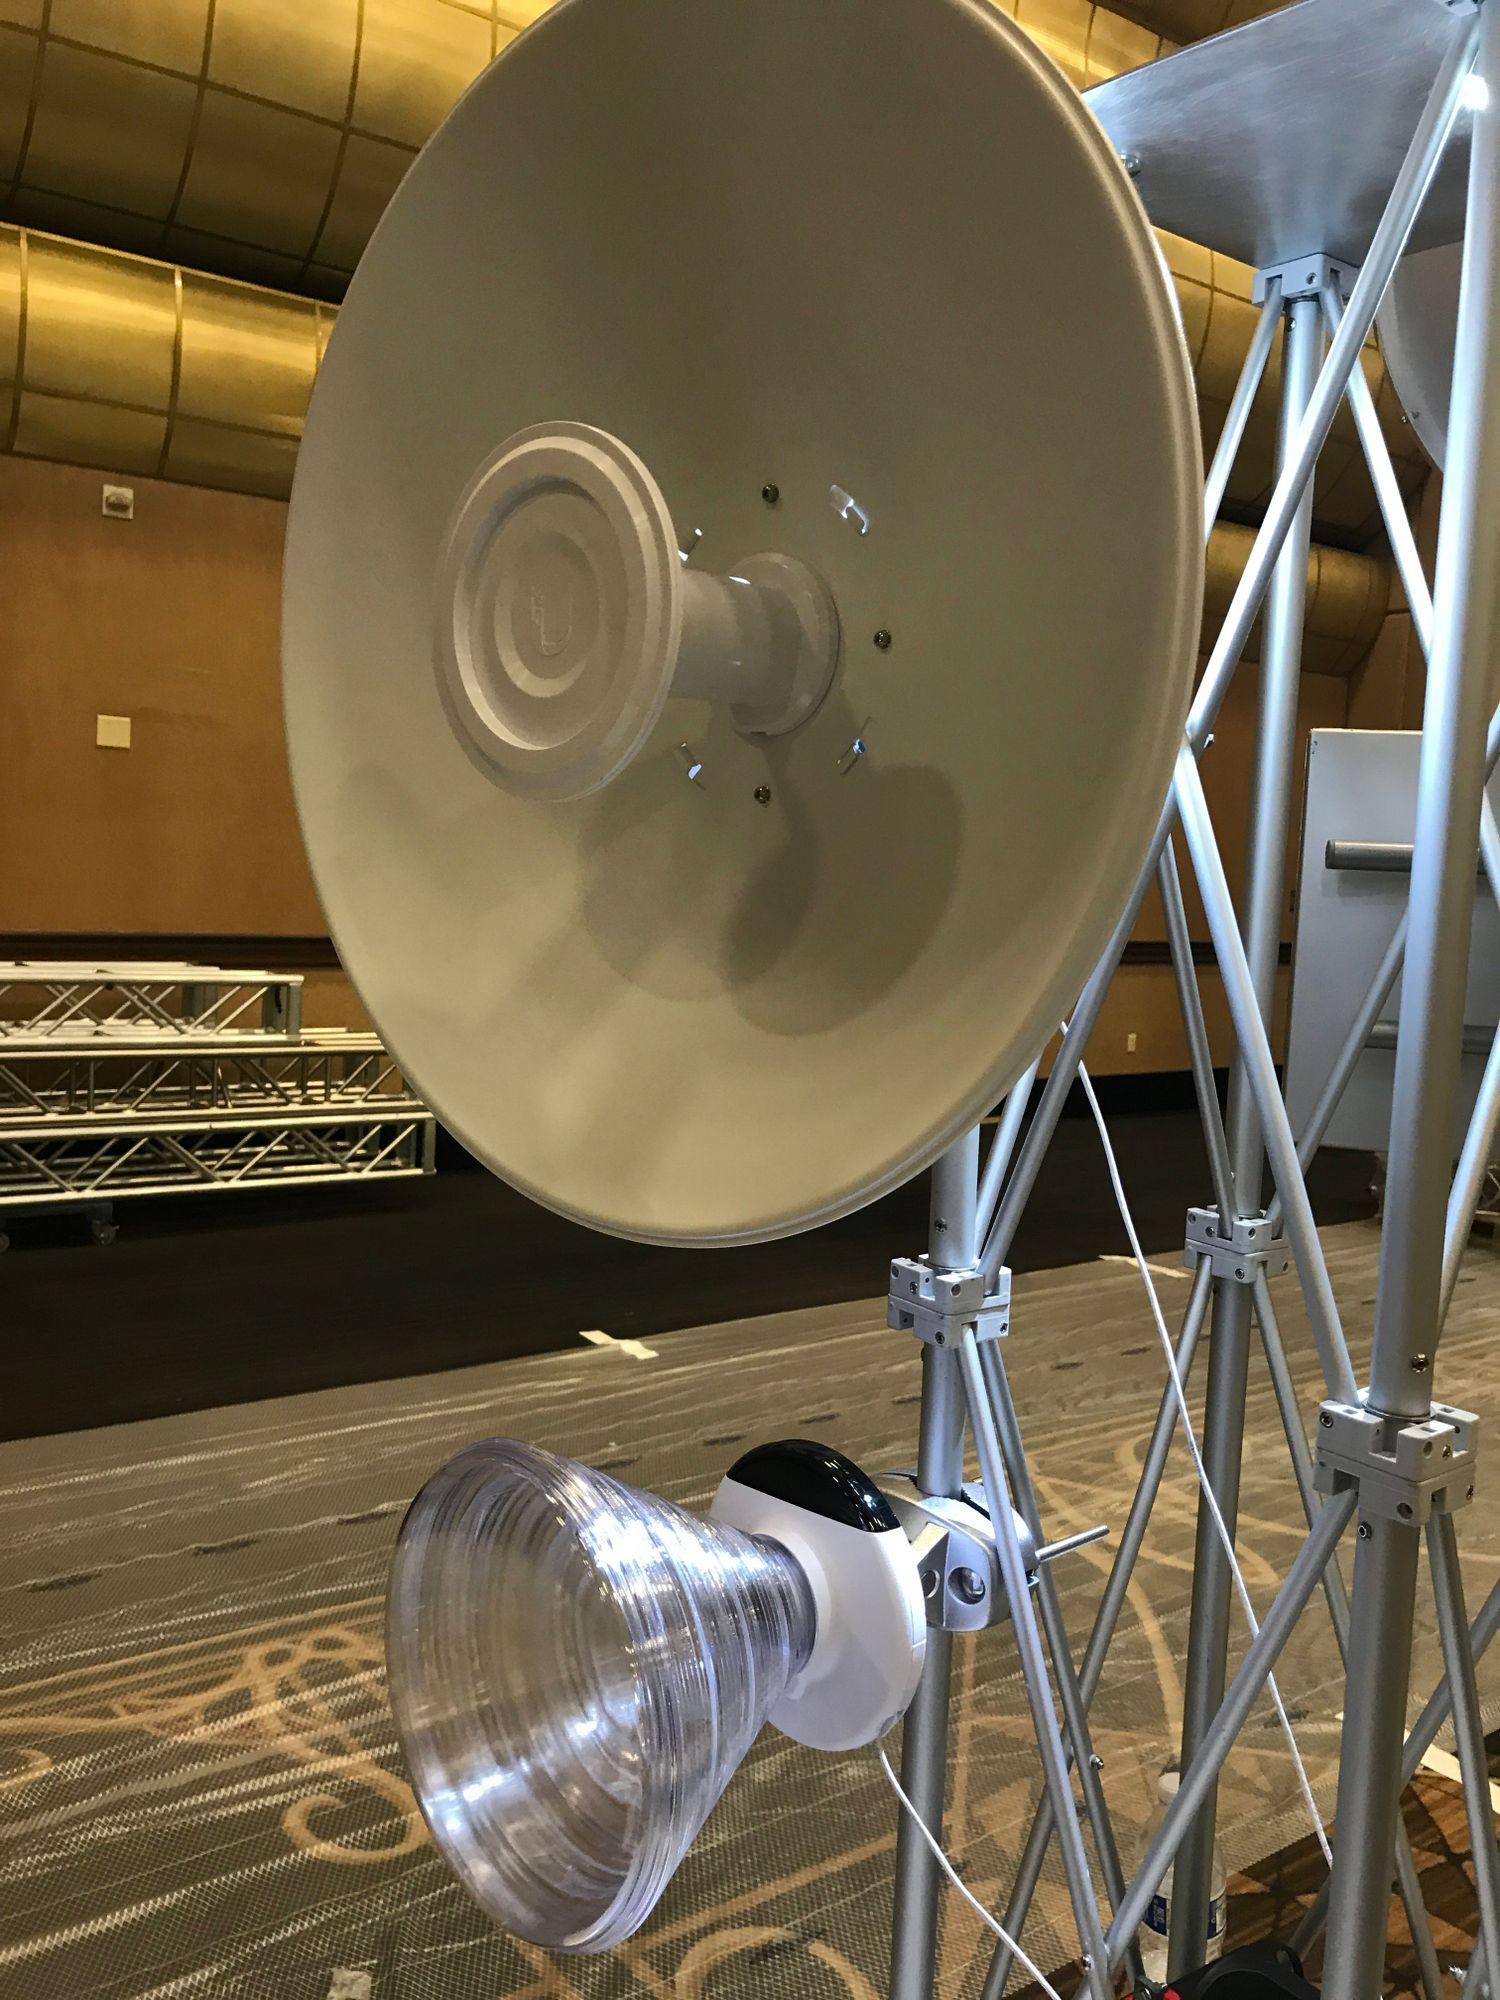 Cool New Ltu Horn Dish Works With Airmax Too Ubiquiti Community